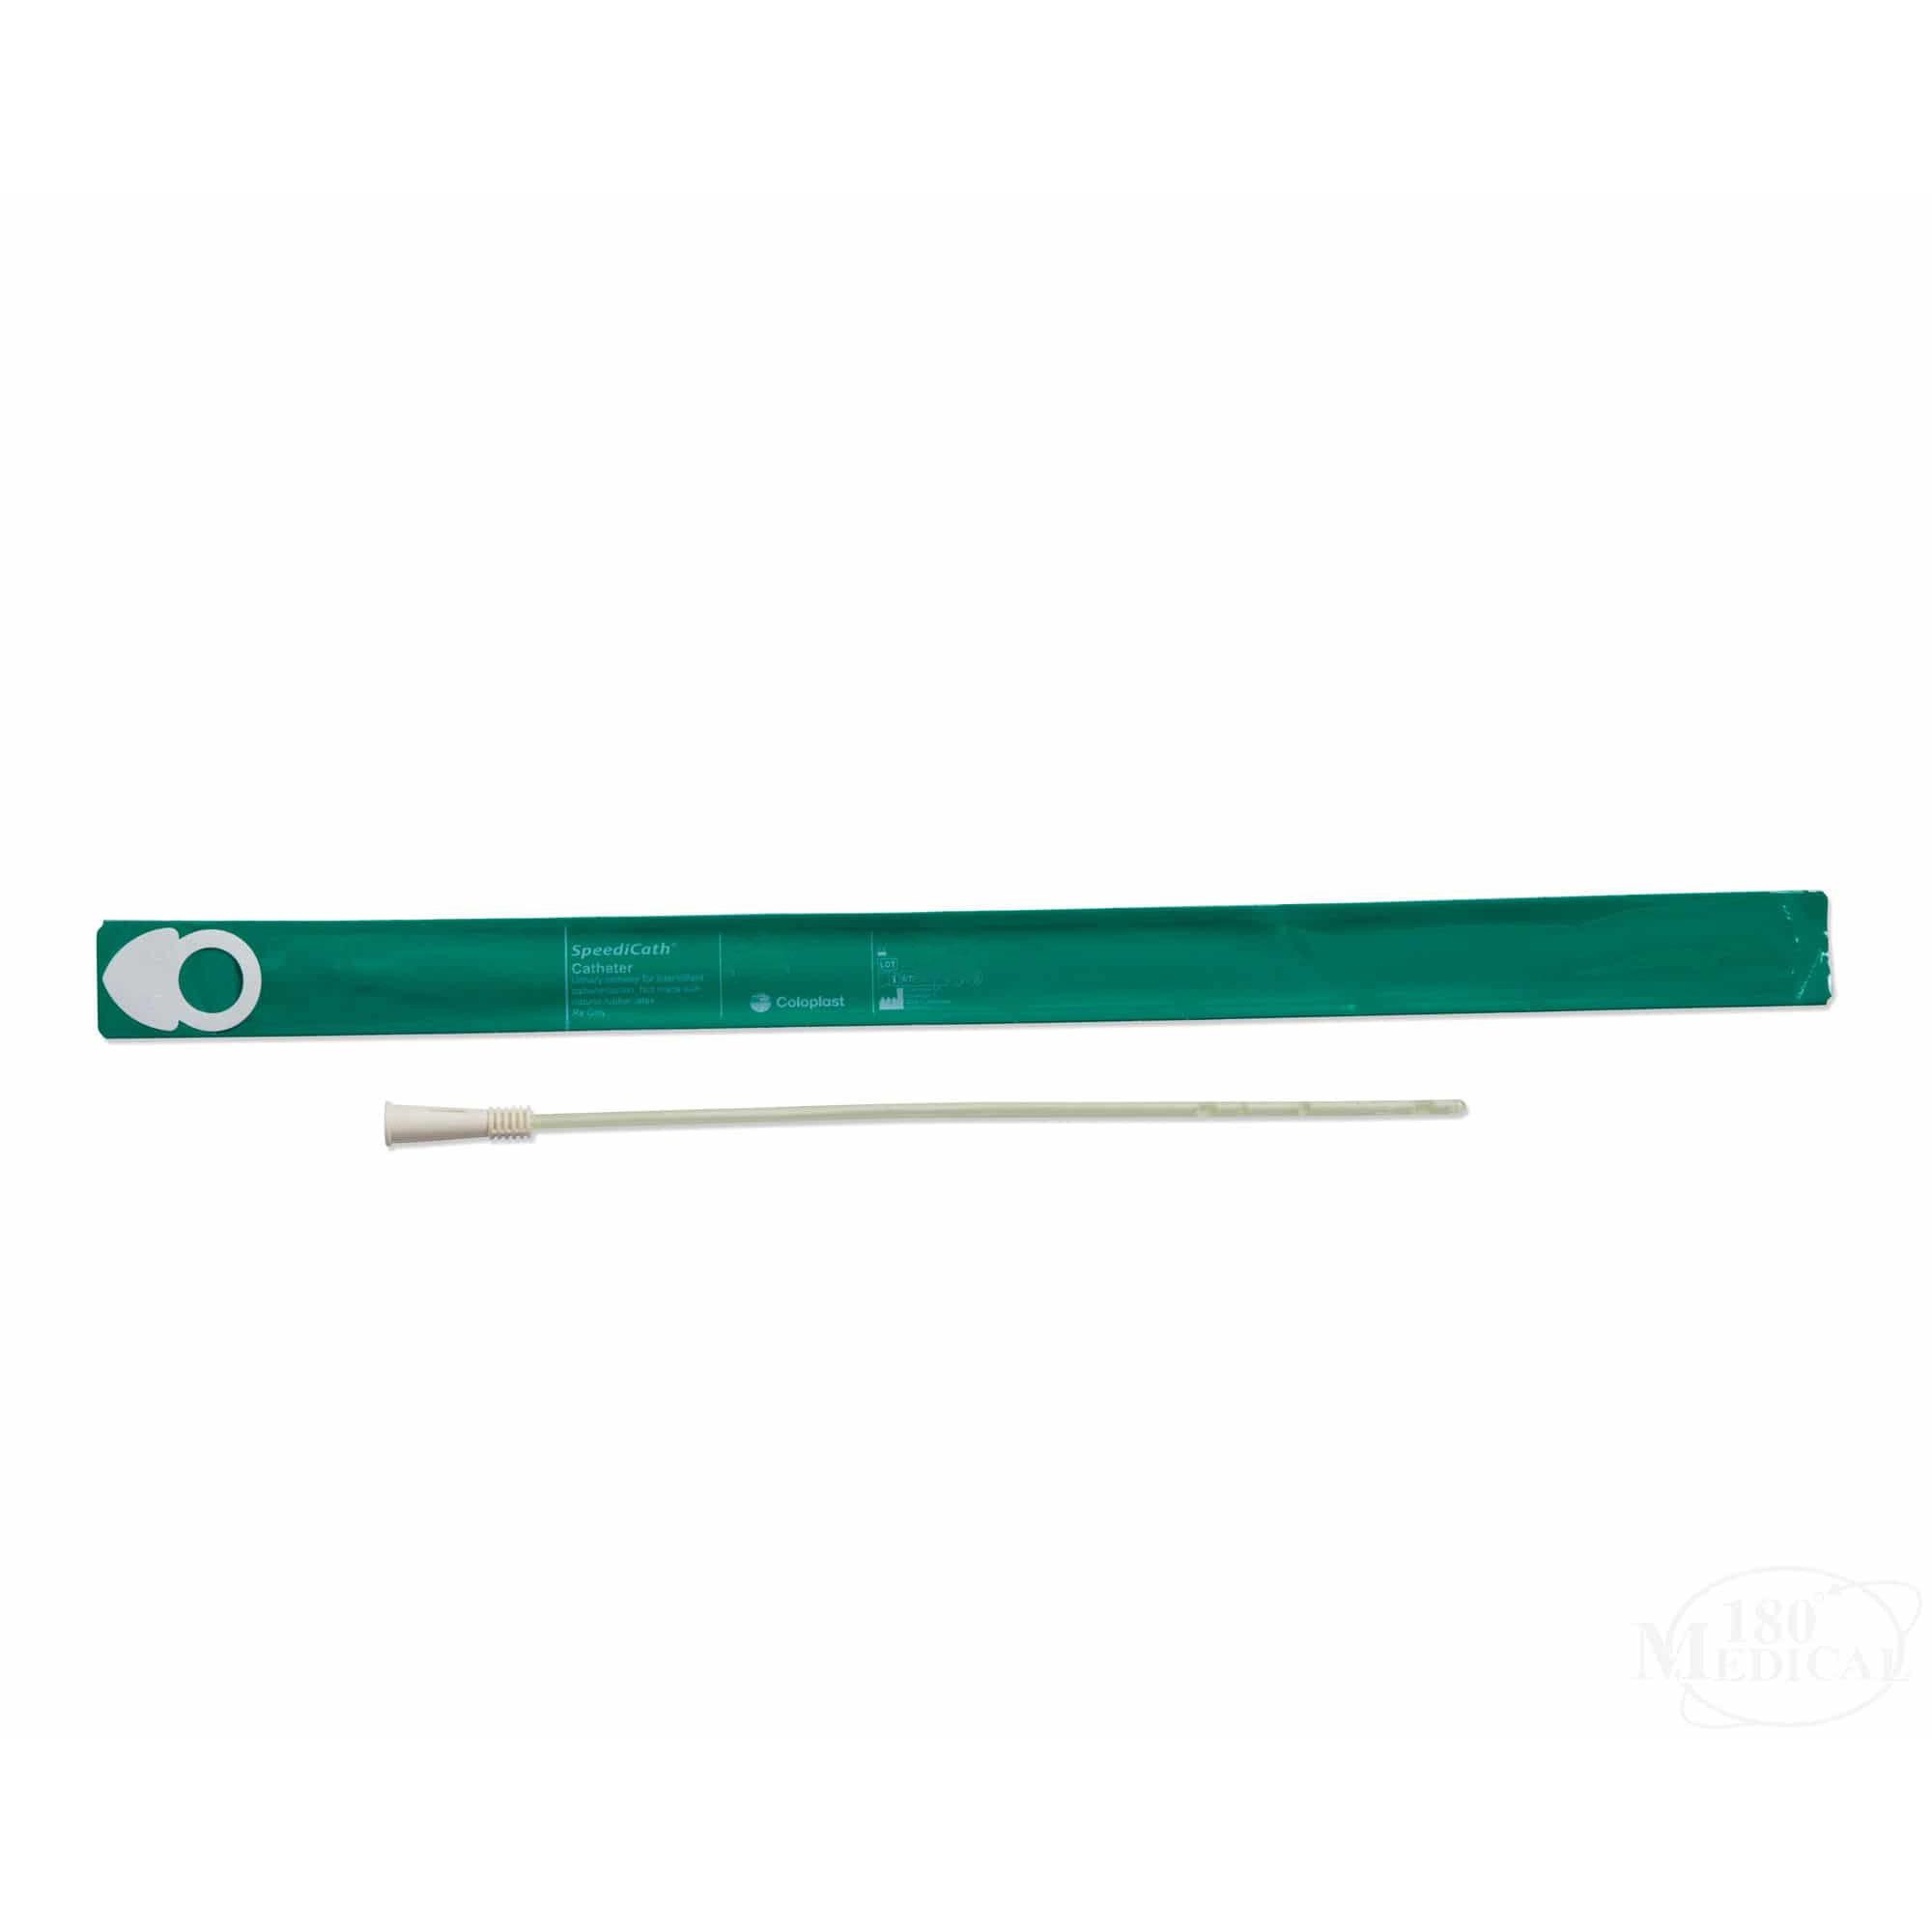 "Coloplast SpeediCath Pediatric Catheter,Straight,Hydrophilic Coating,Sterile,PVC 6Fr, 10"" L"